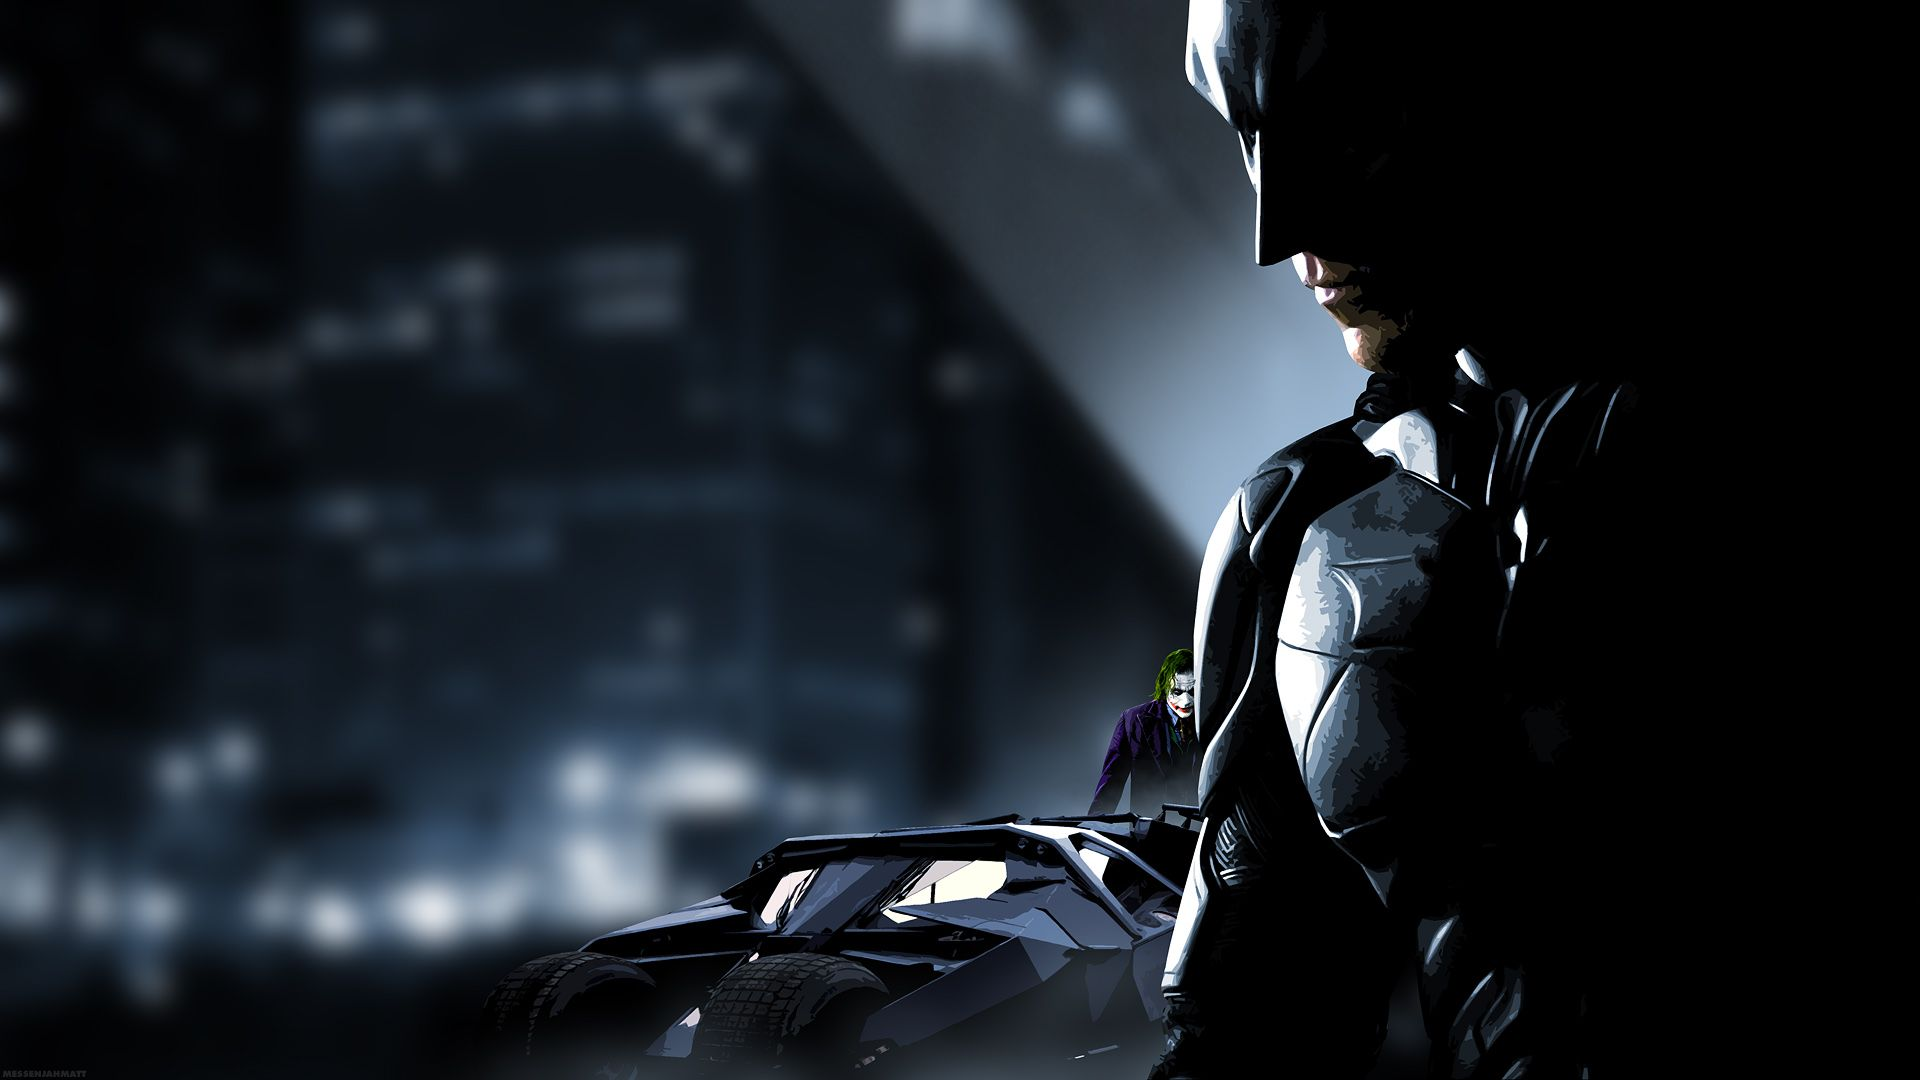 Hd wallpaper man - Best 25 Hd Batman Wallpaper Ideas On Pinterest Batman Artwork Dark Knight Wallpaper And Batman